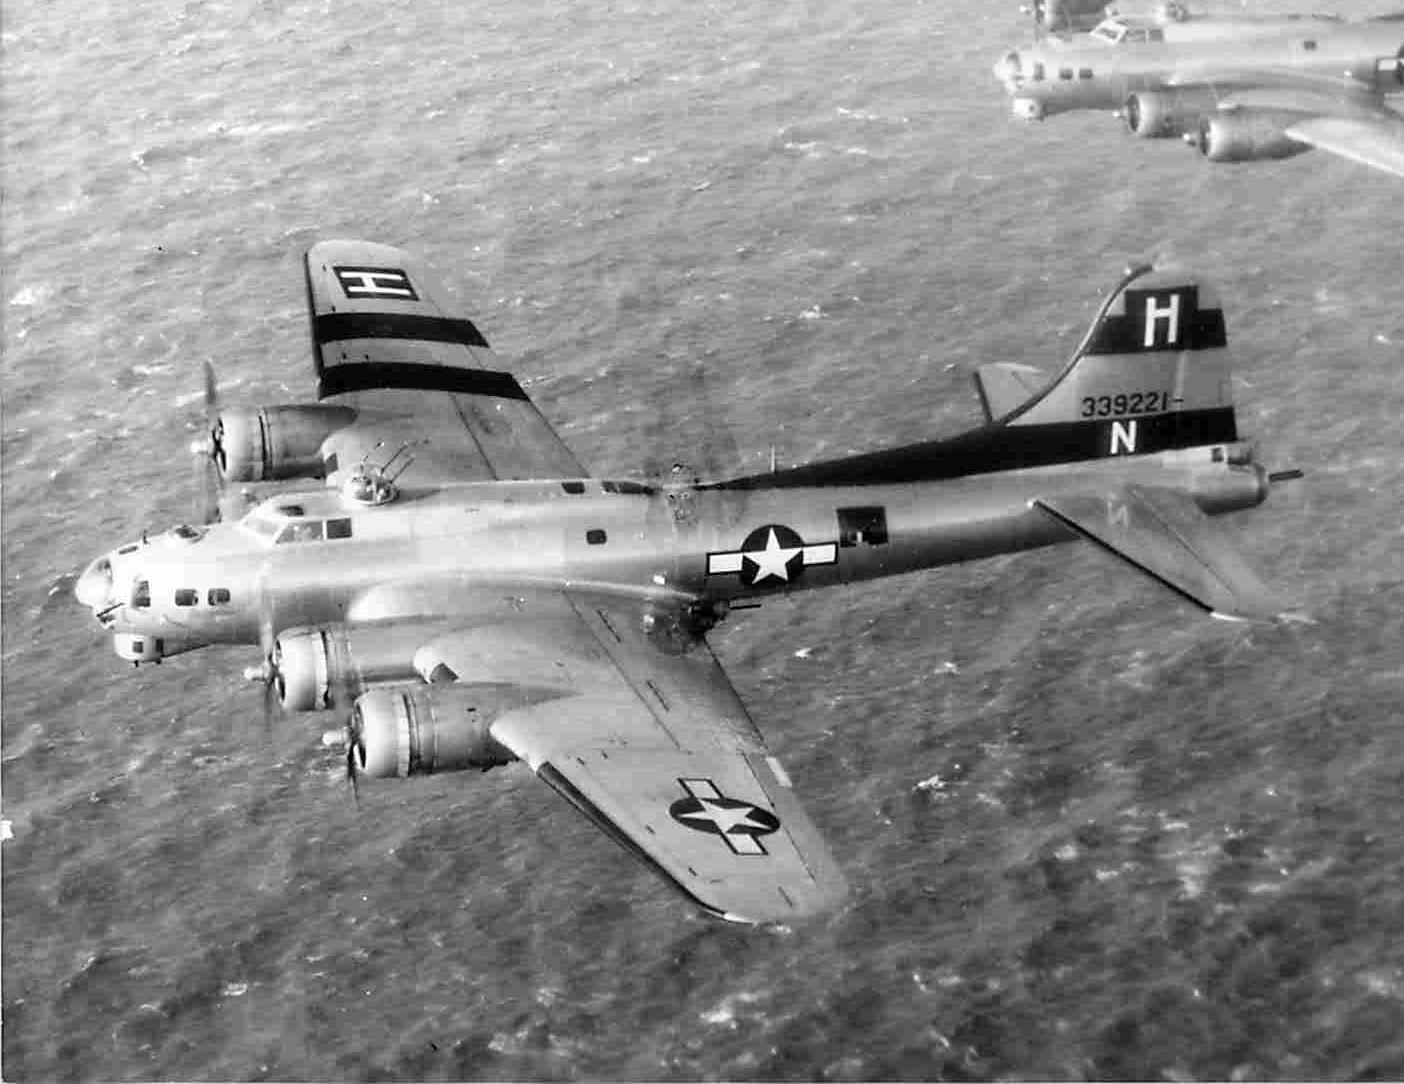 B-17 #43-39221